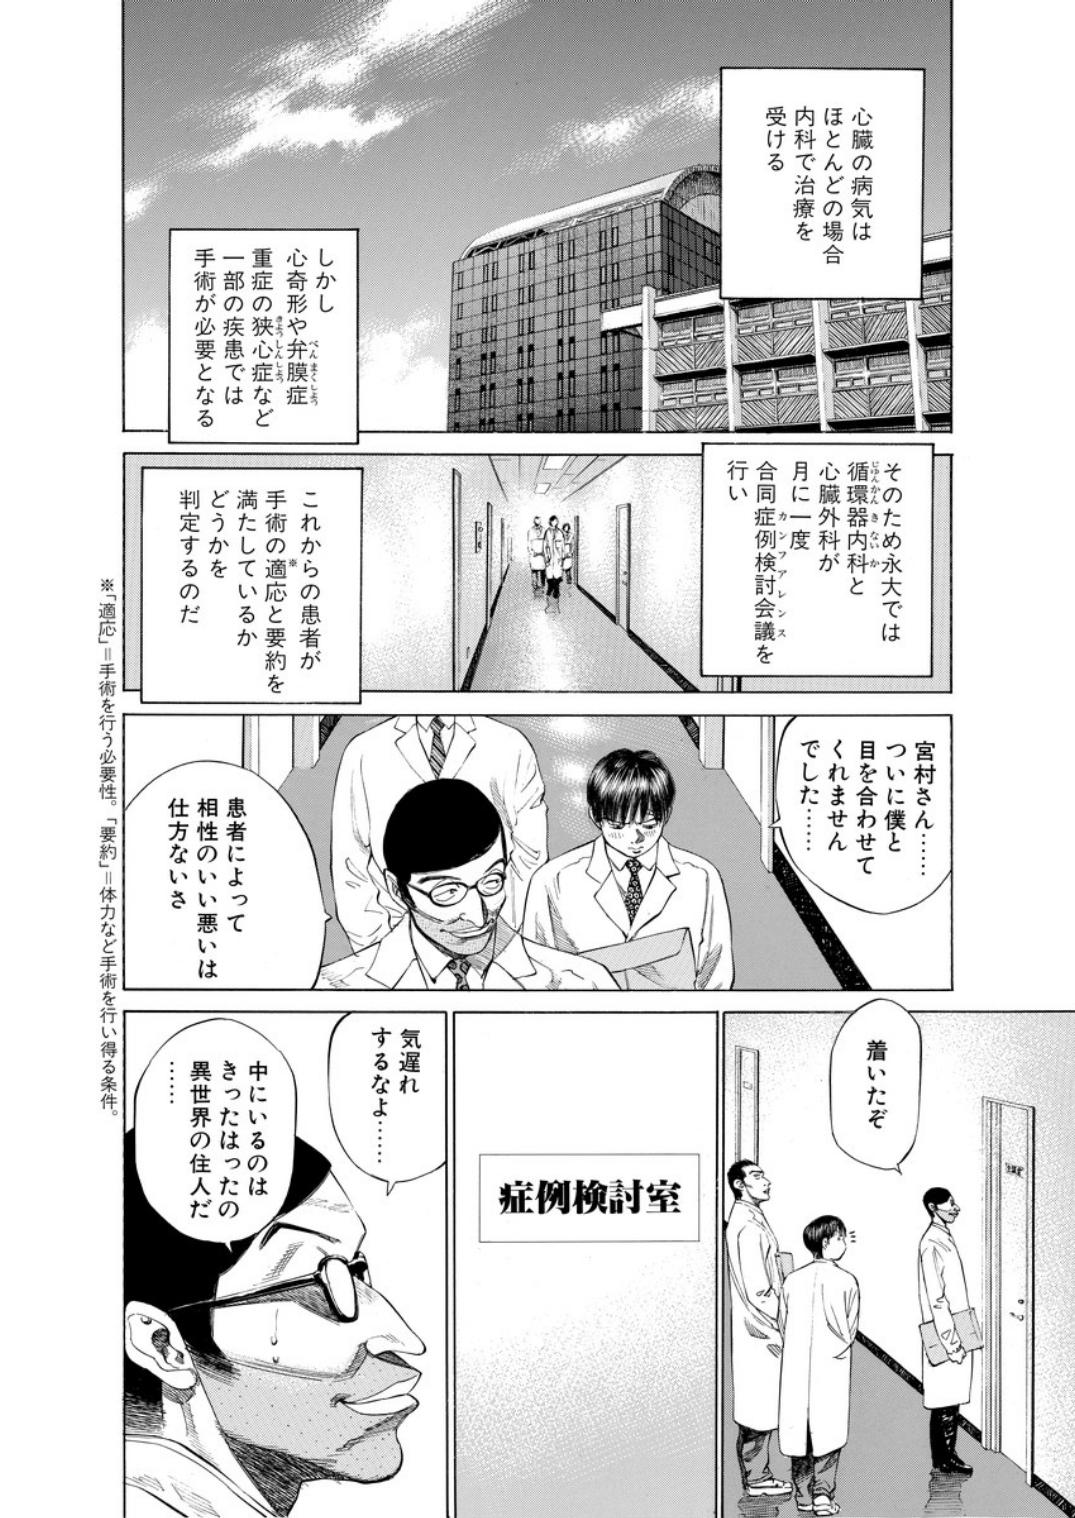 001bj_page-0194.jpg